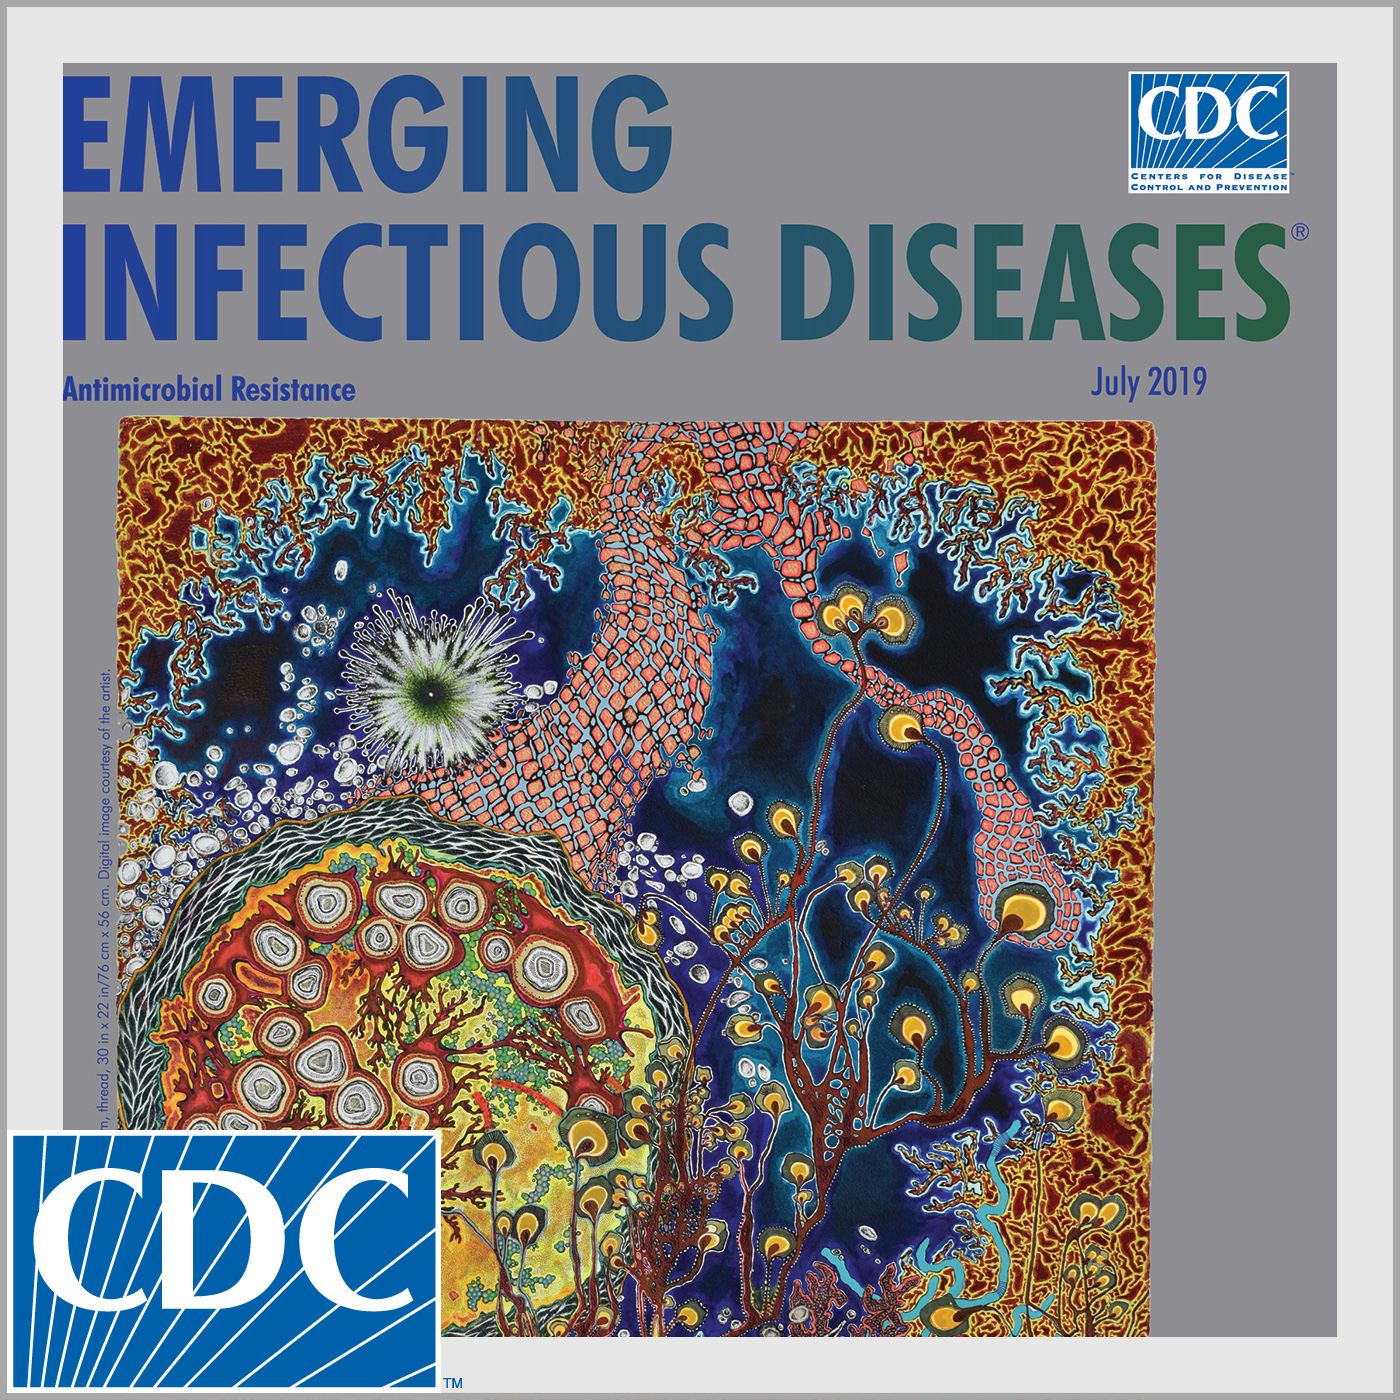 Emergence of MDR Campylobacter jejuni bacterium